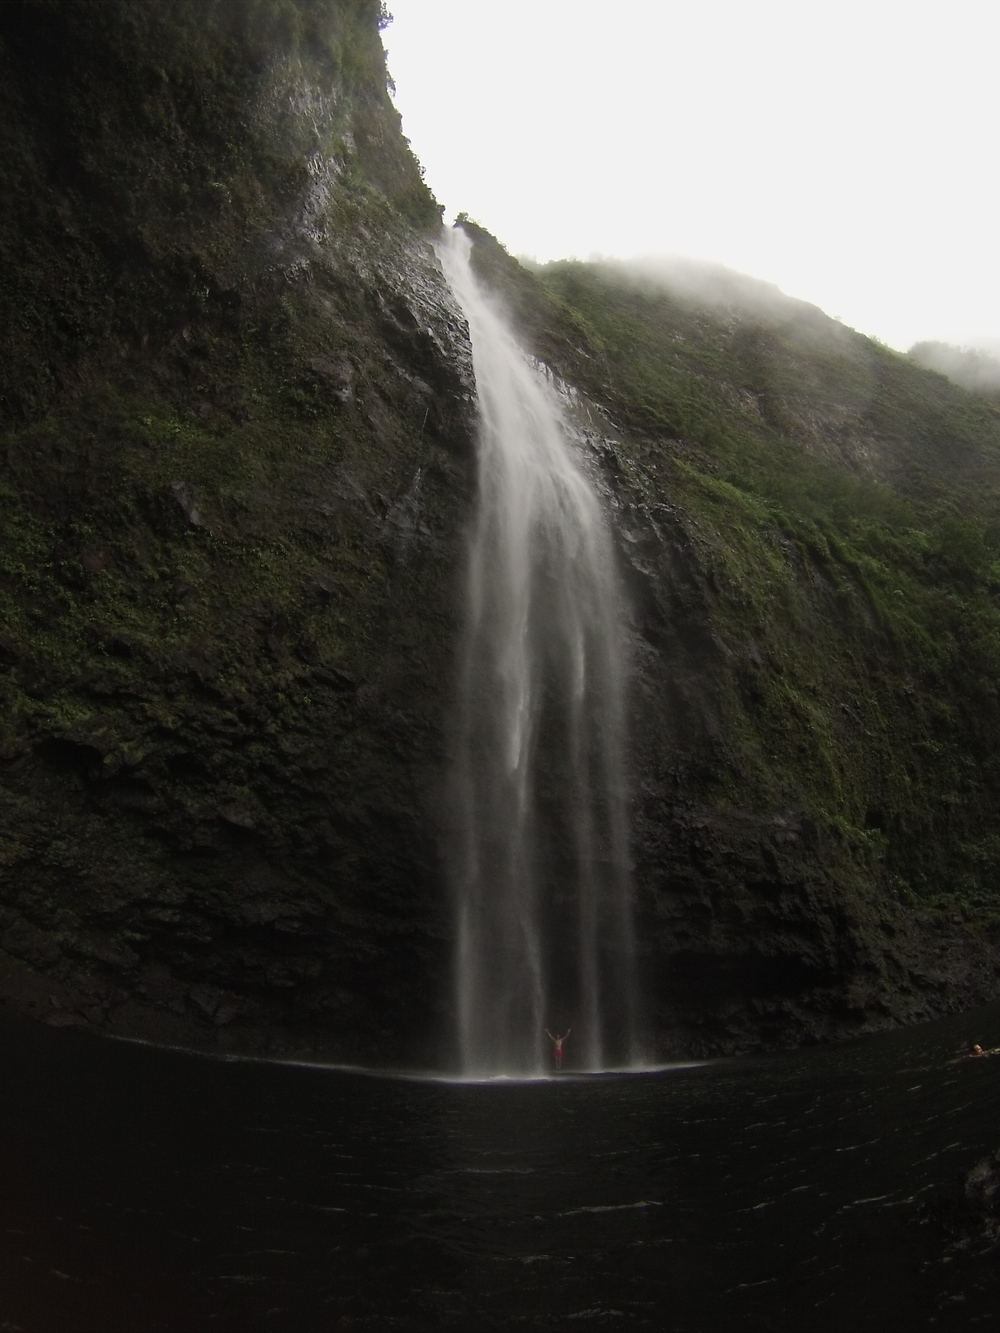 That's me celebratingunder a1600' waterfall in Kauai. Life is Beautiful